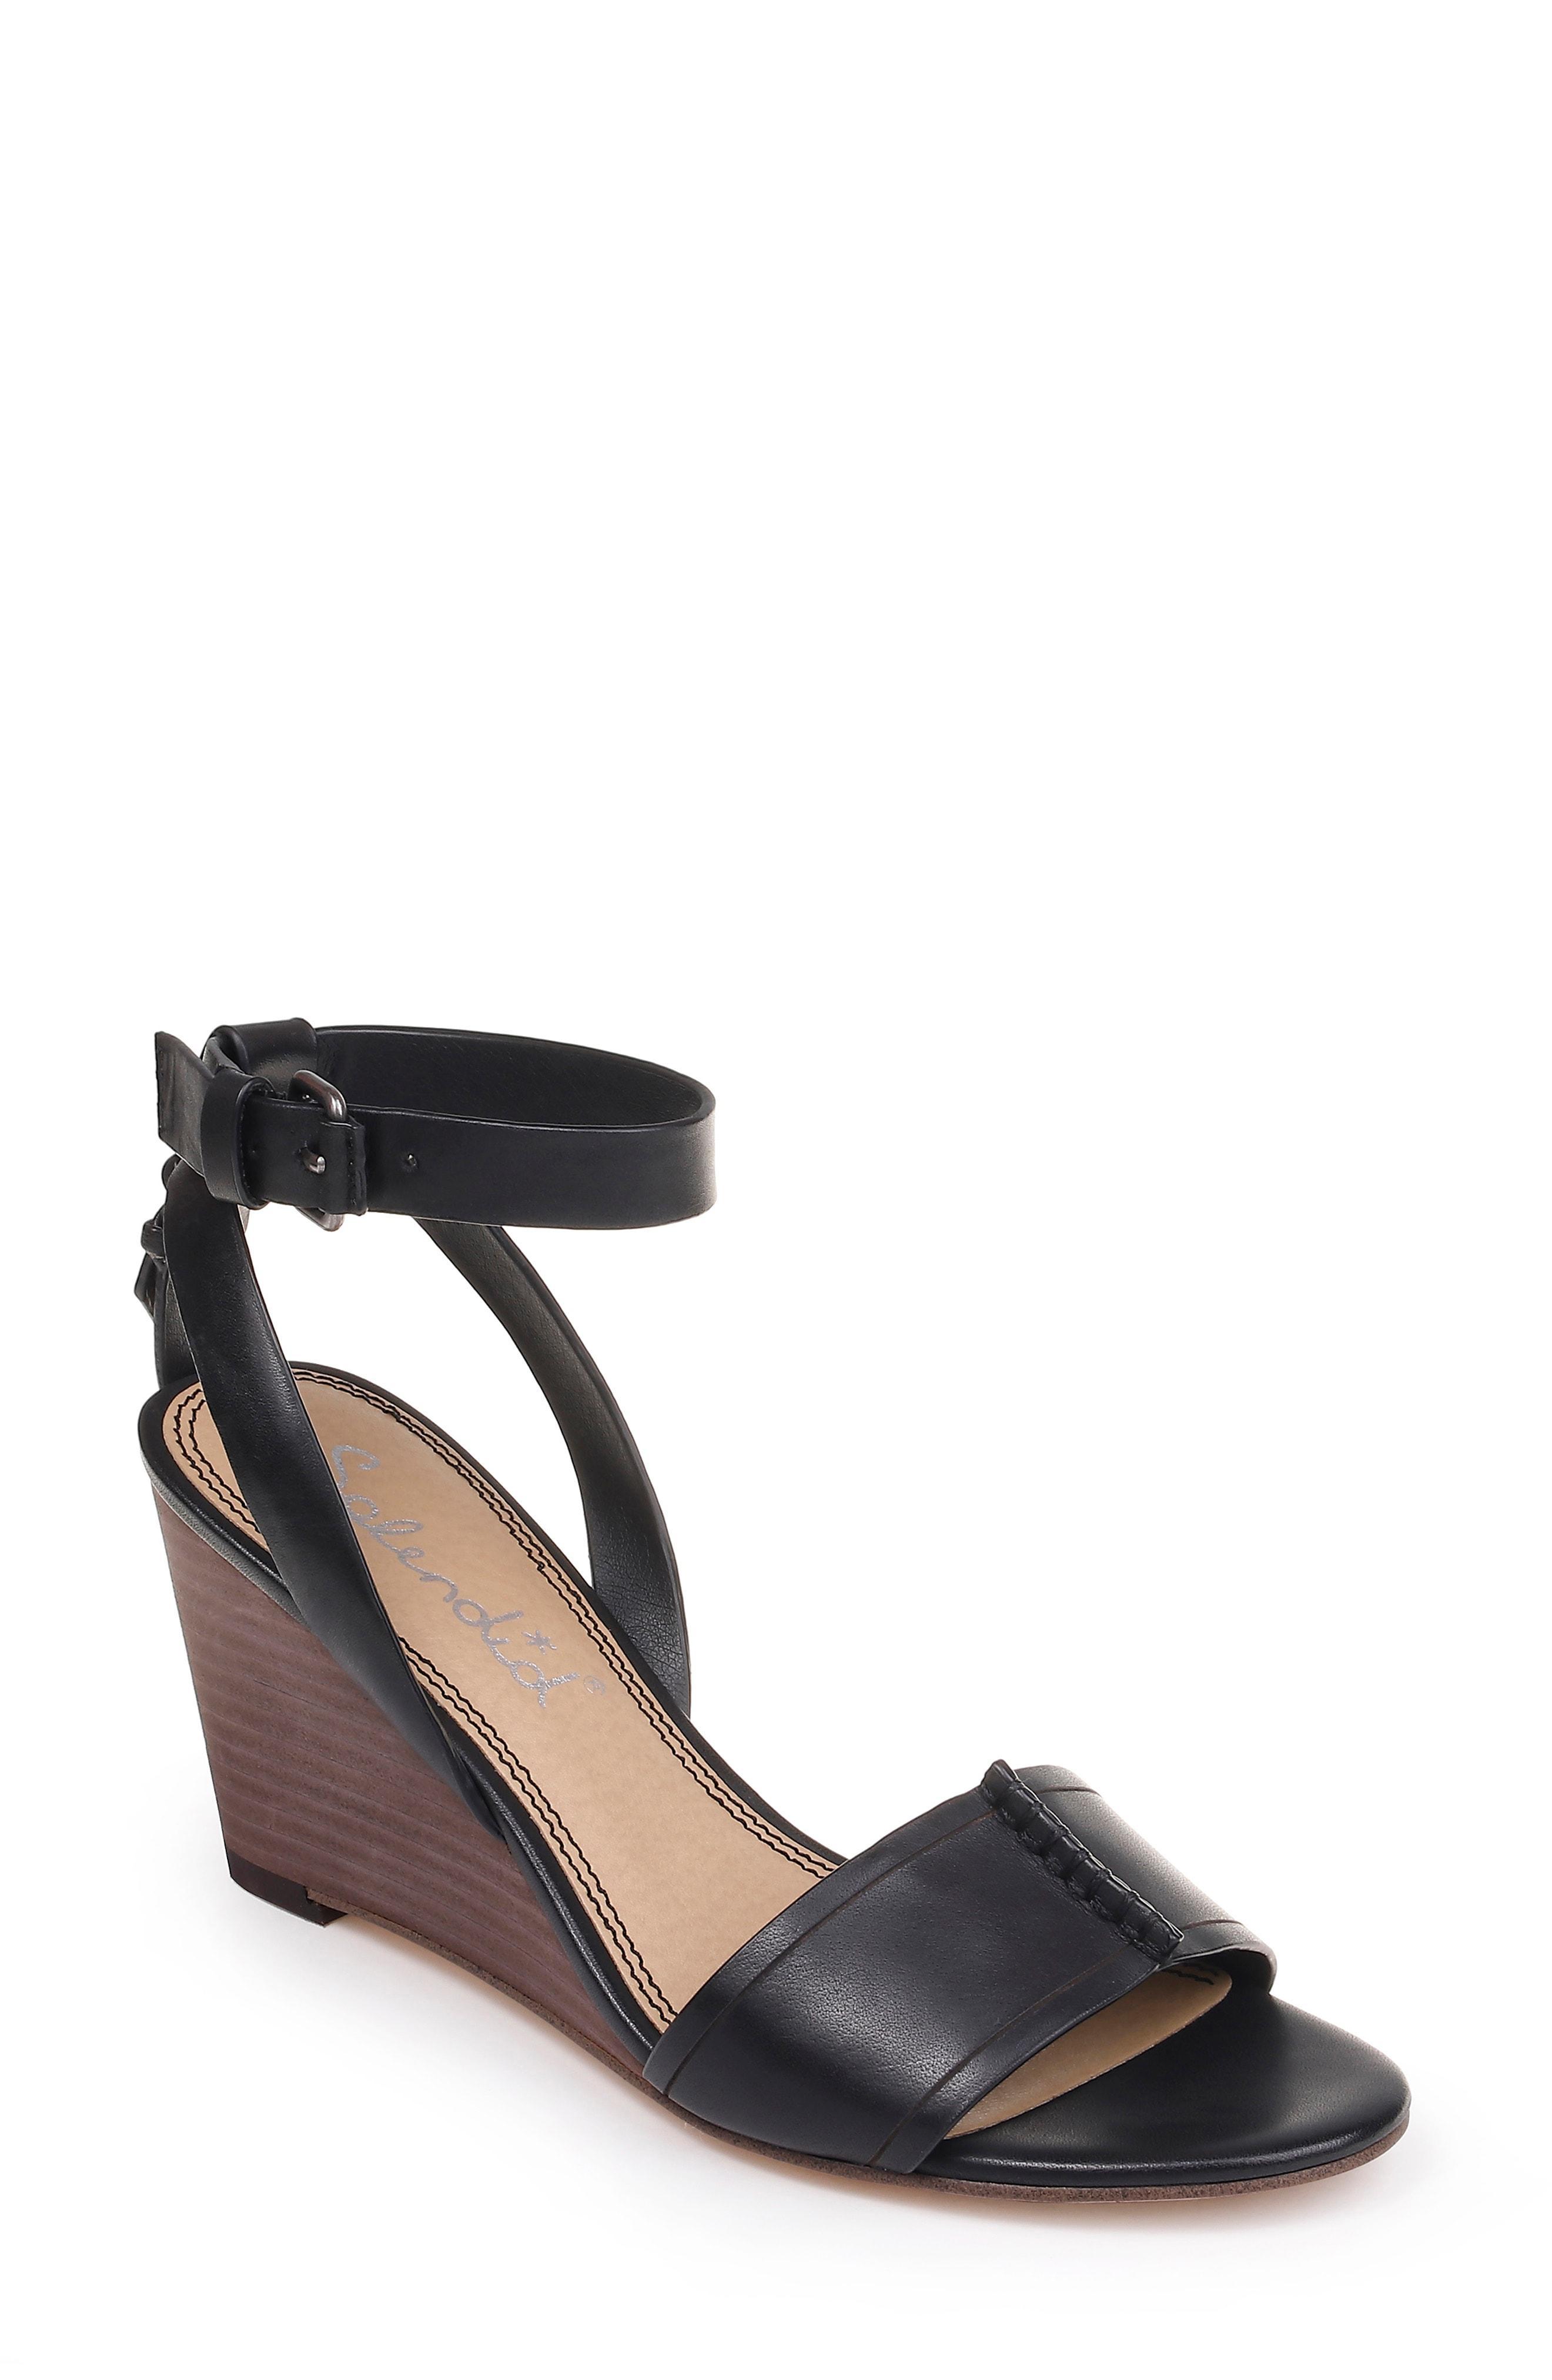 13f3a2f566d20 Lyst - Splendid Tadeo Wedge Ankle Strap Sandal in Black